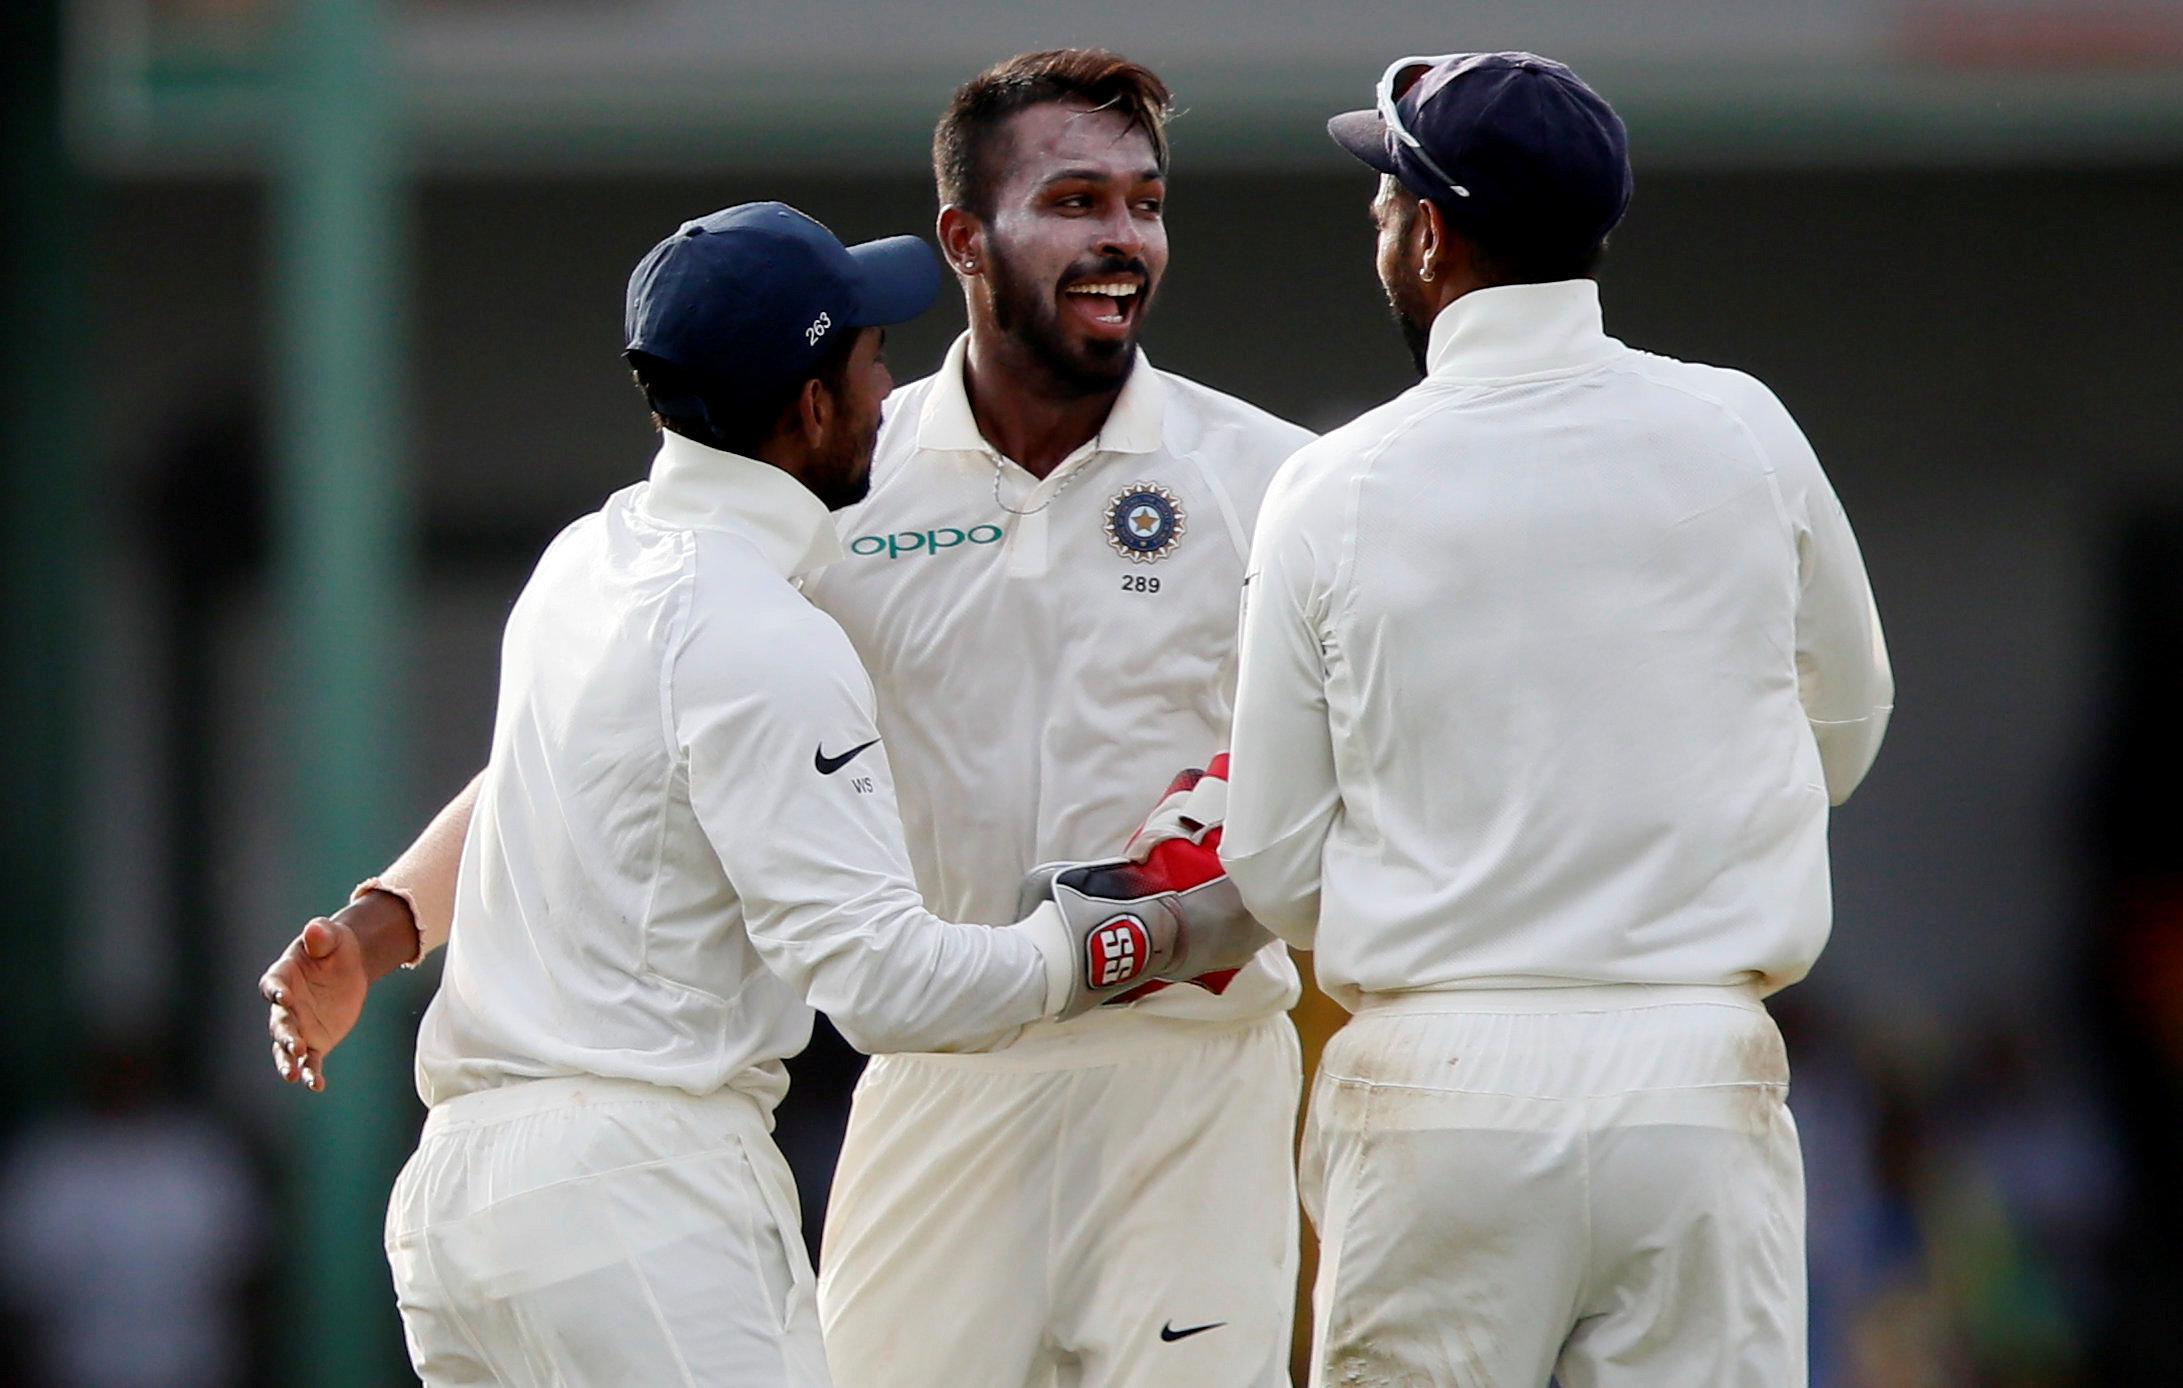 Cricket: India's Saha proves keeping pedigree with Colombo masterclass